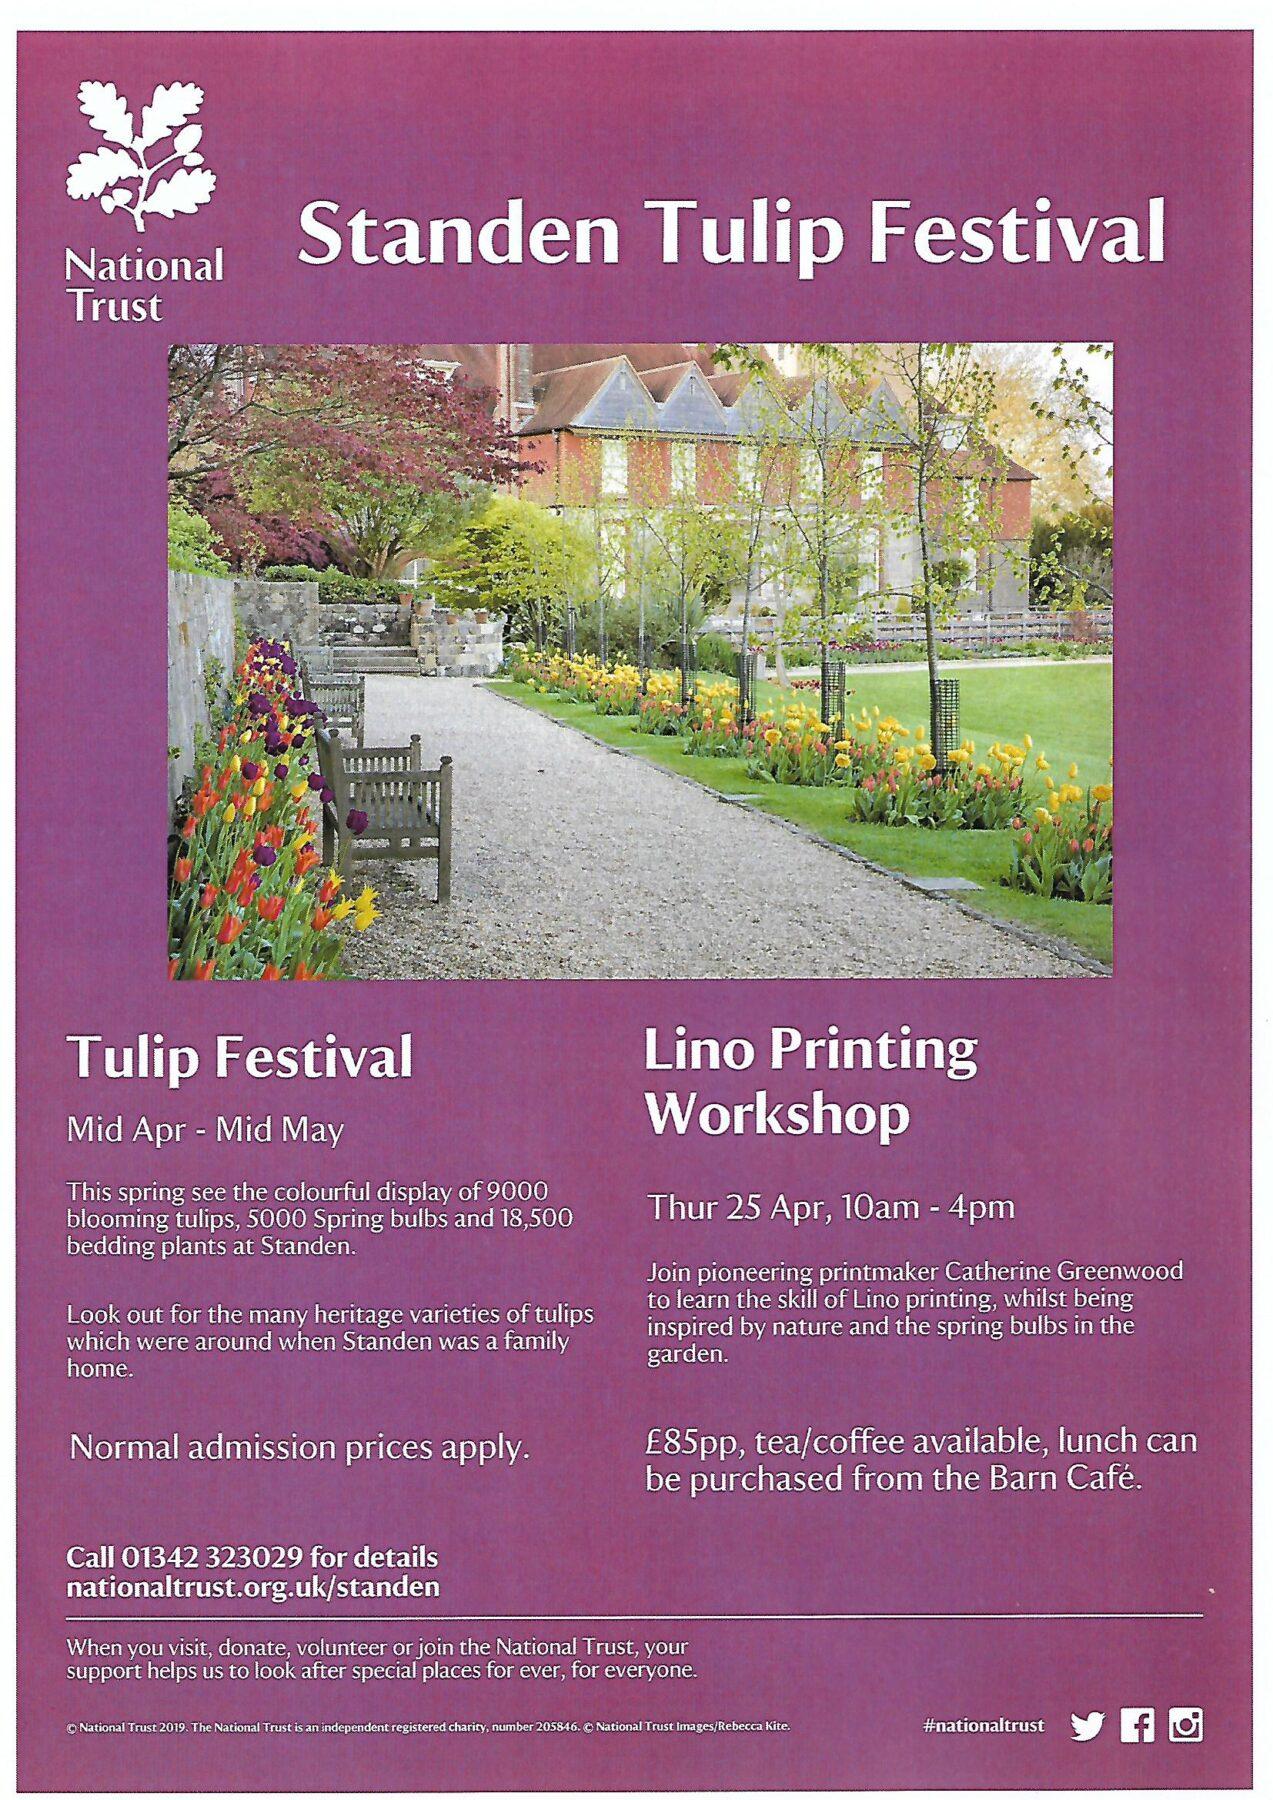 Tulip festival at Standen